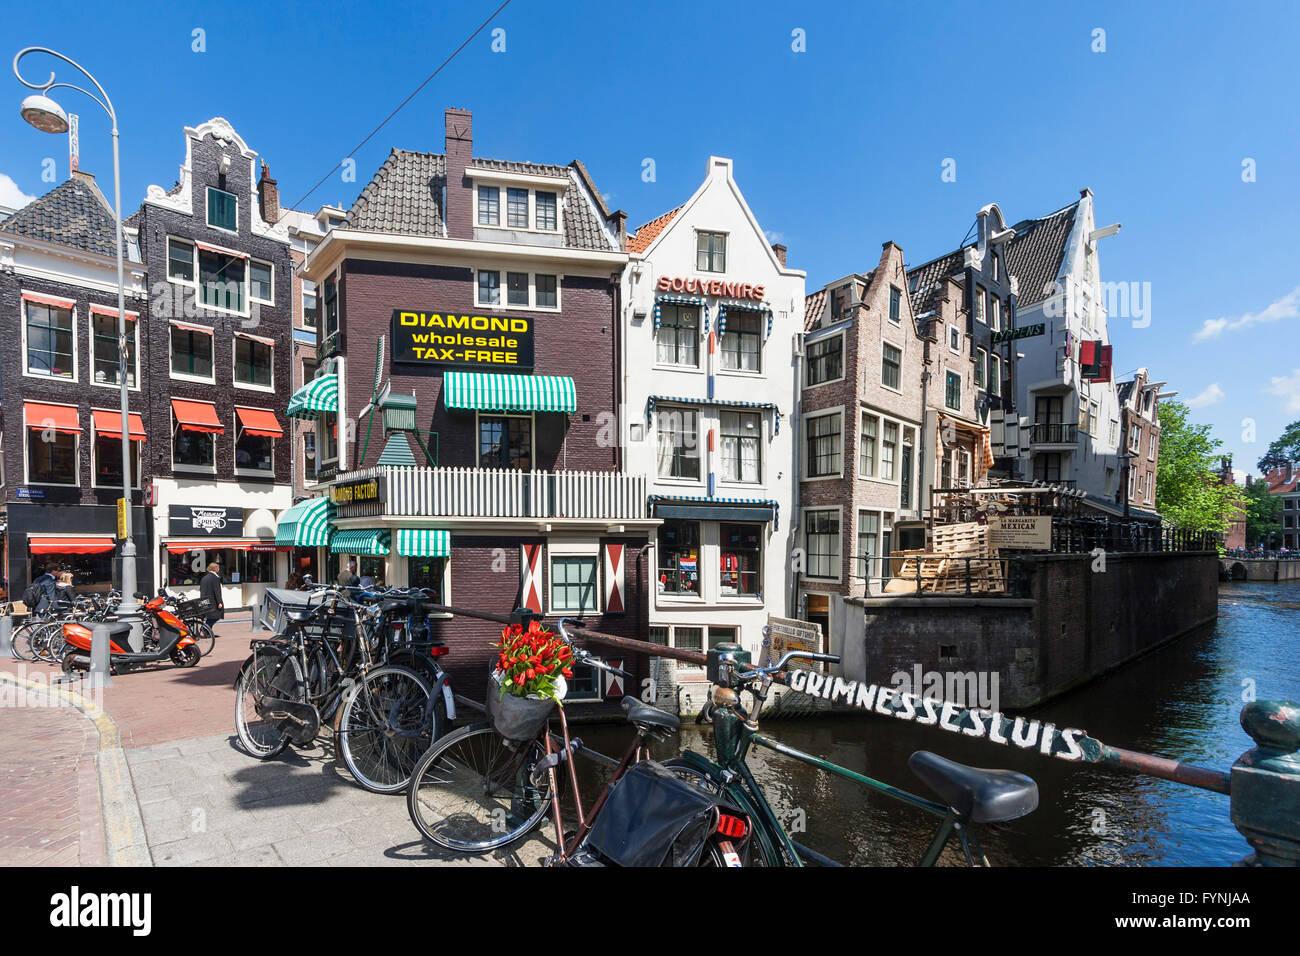 Amsterdam diamont factory , Grimnesssluis, bicycles, tulips,  Amsterdam, Netherlands - Stock Image